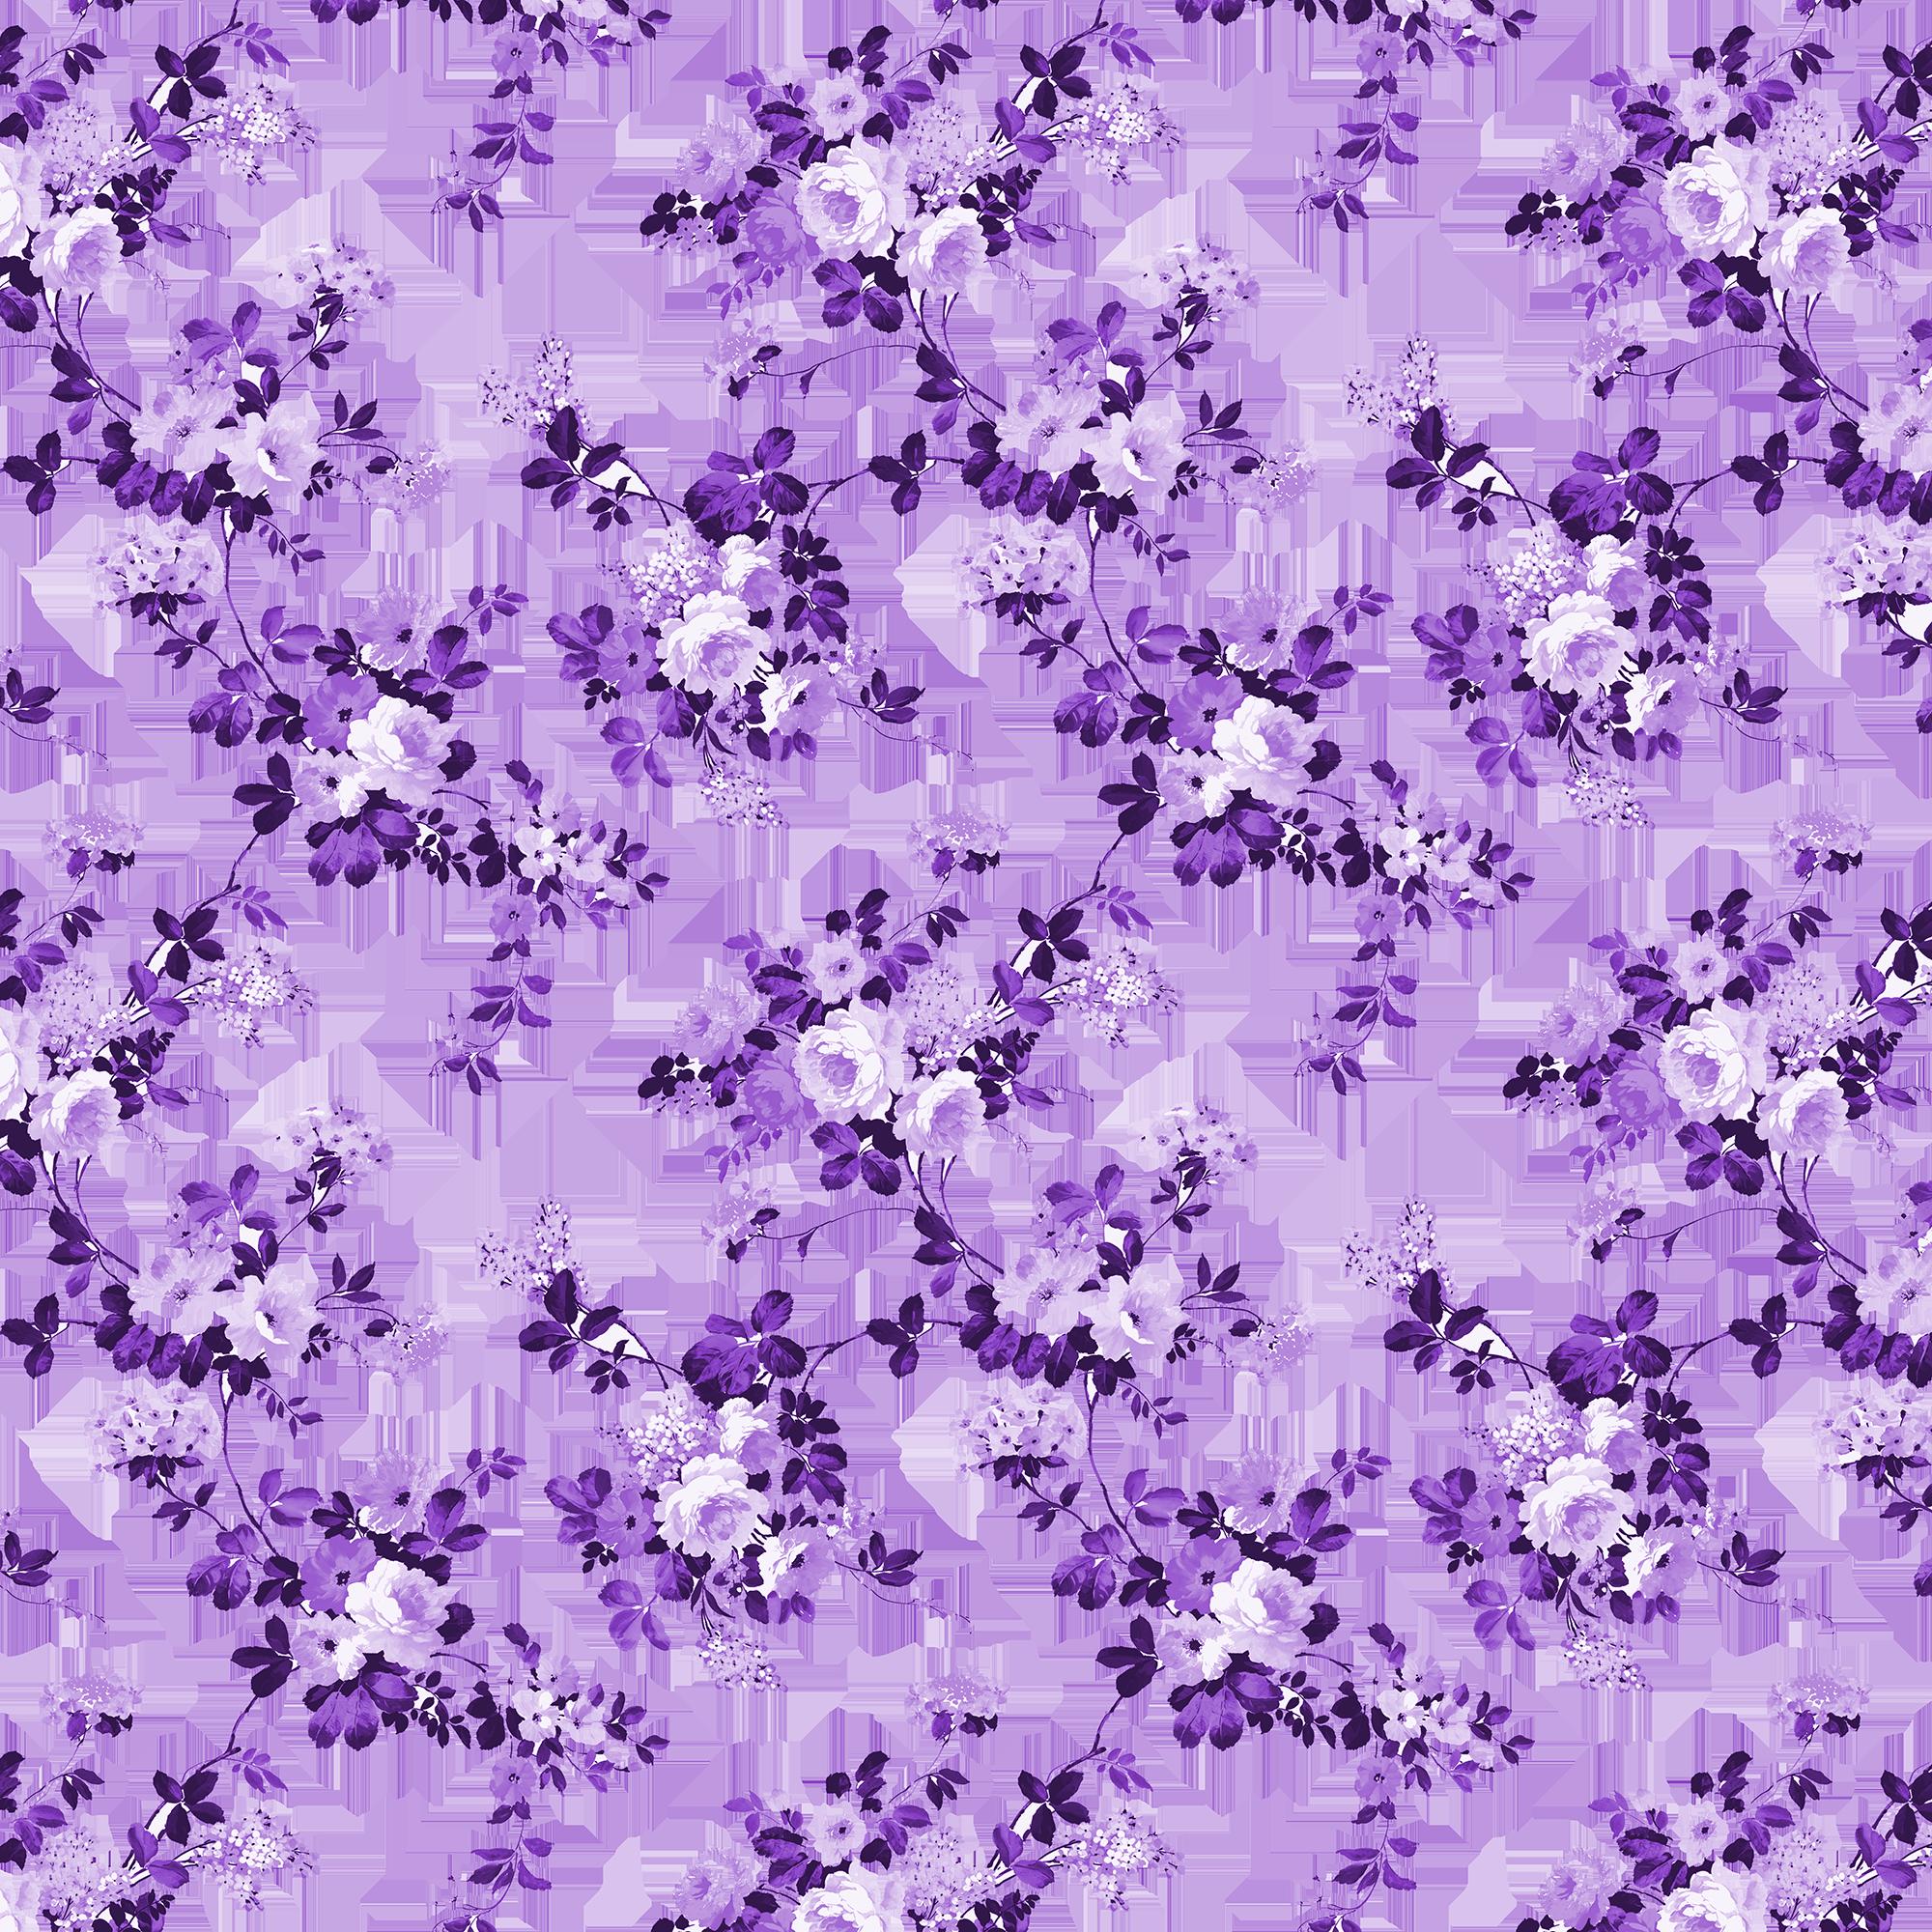 Iphone Xs Case Vintage Lavender Purple Elegant Roses Floral By